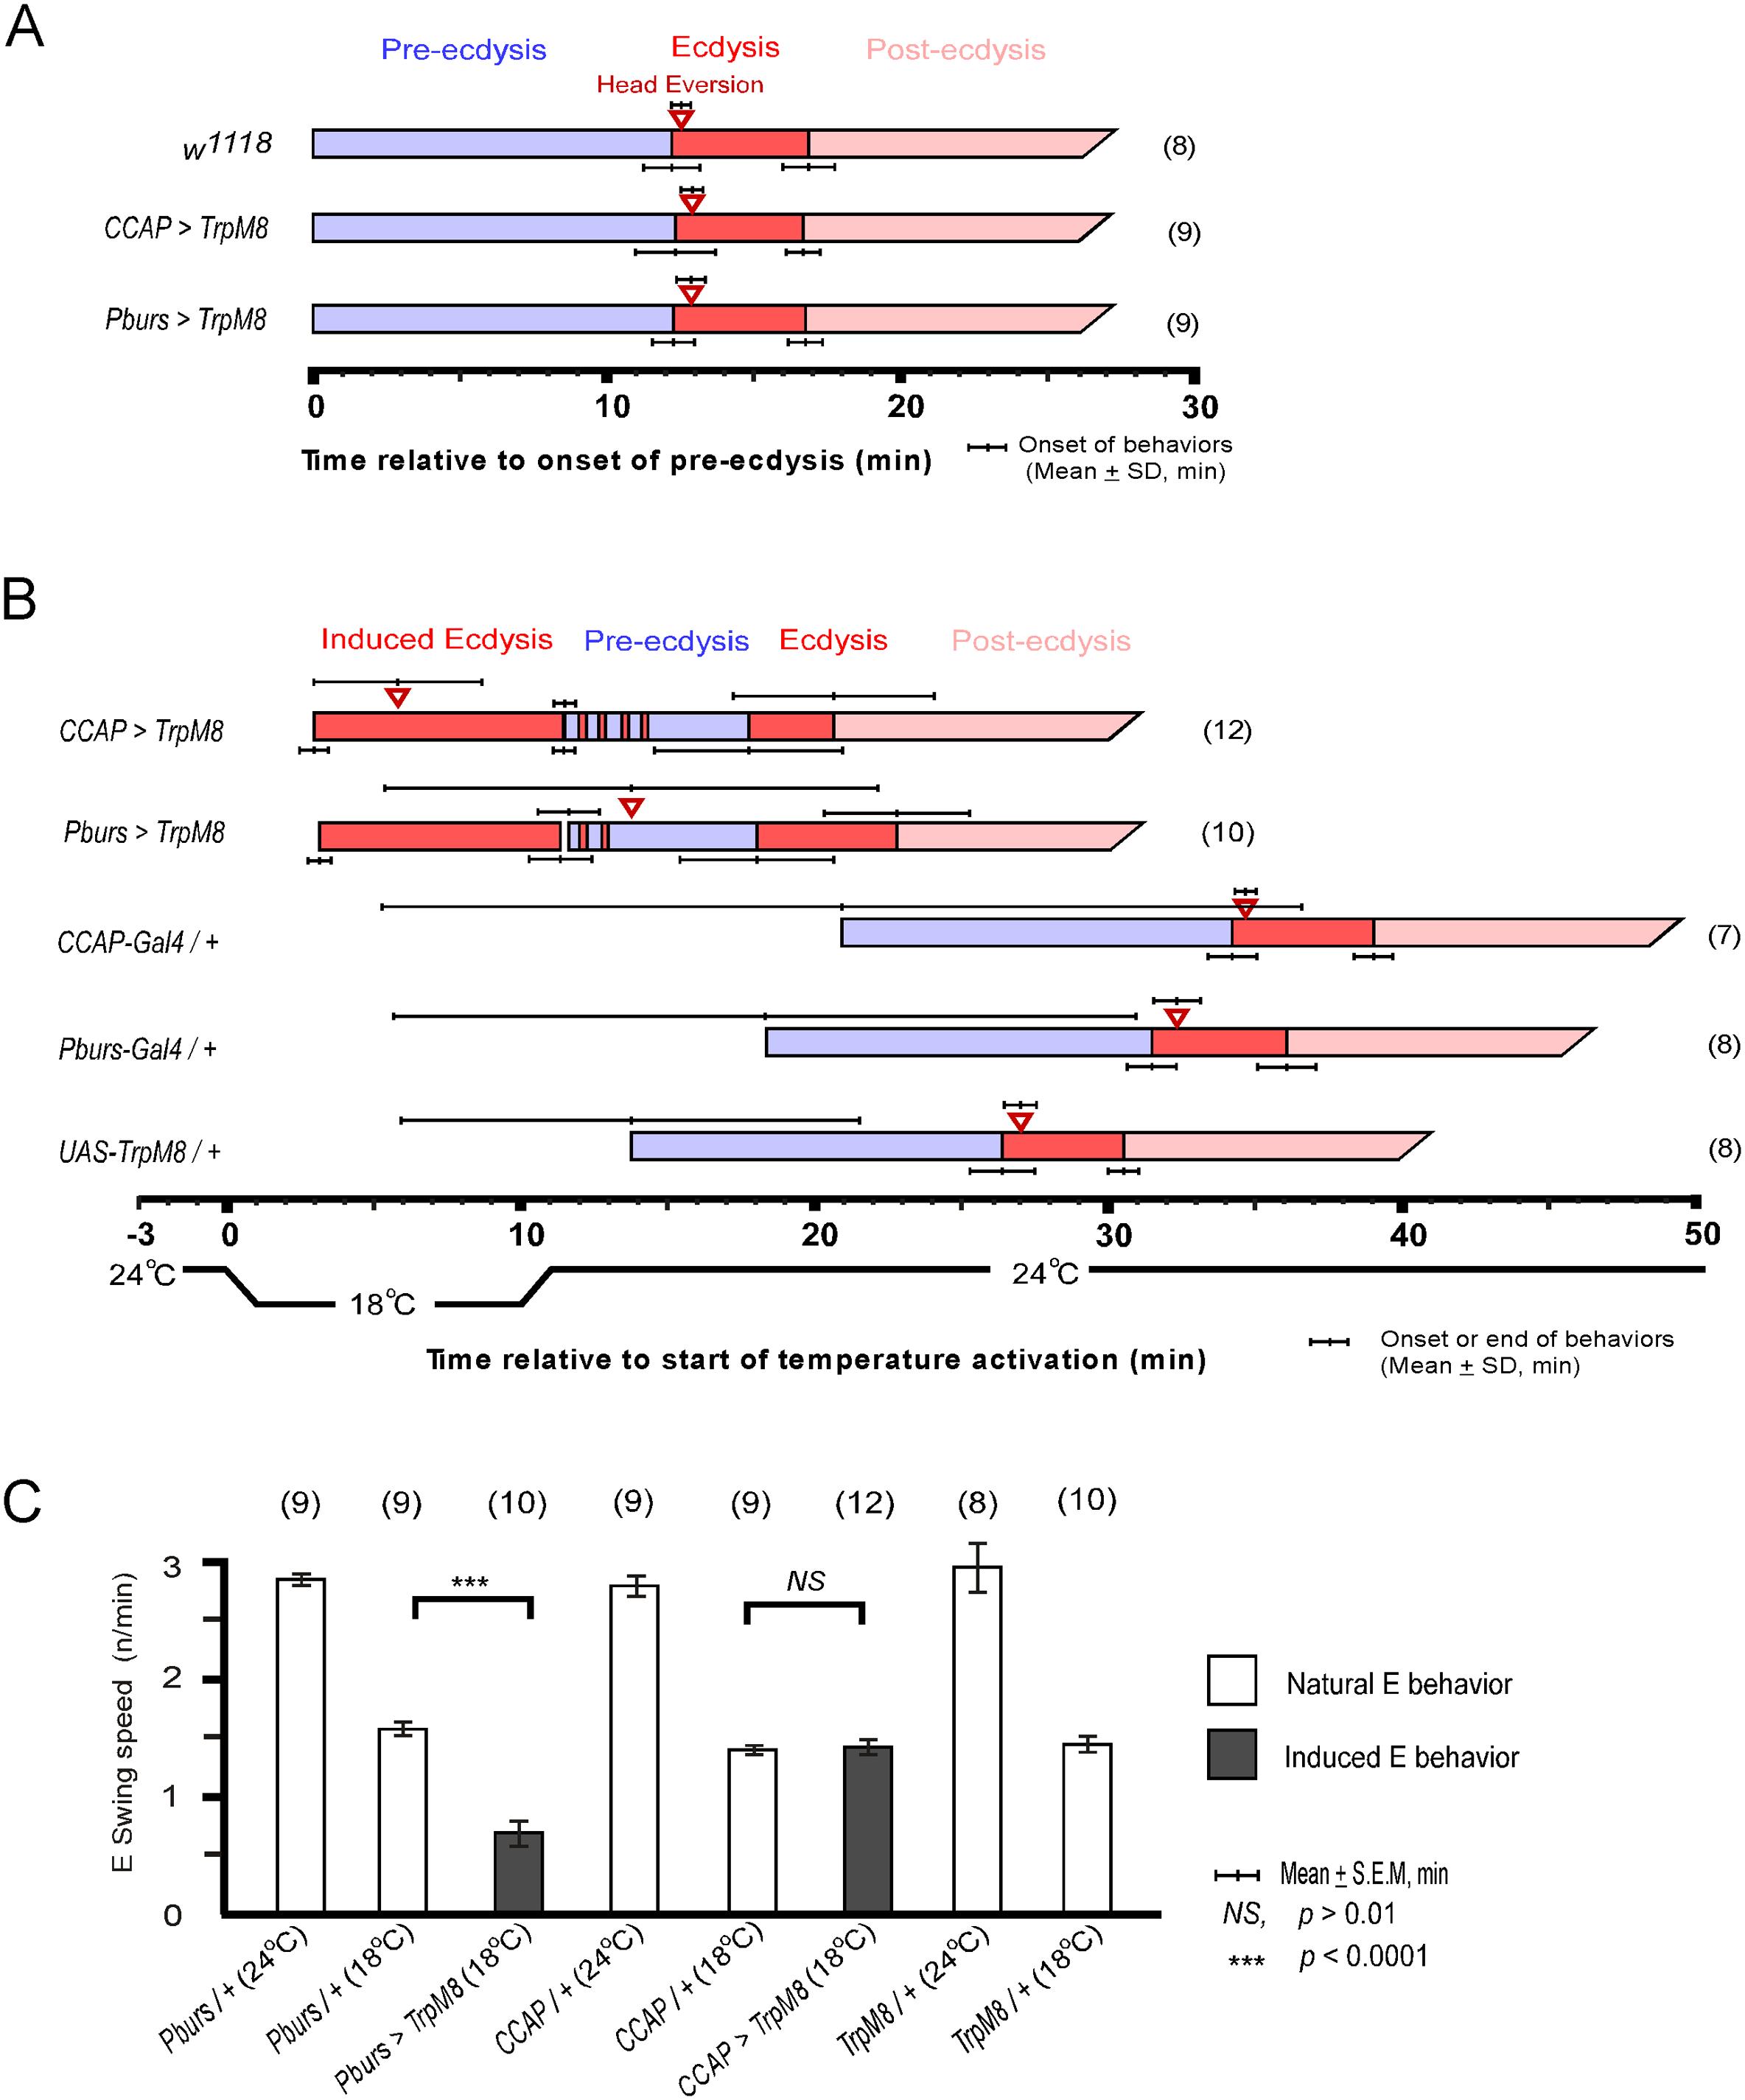 Activation of CCAP and CAMB neurons initiates ecdysis behavior.